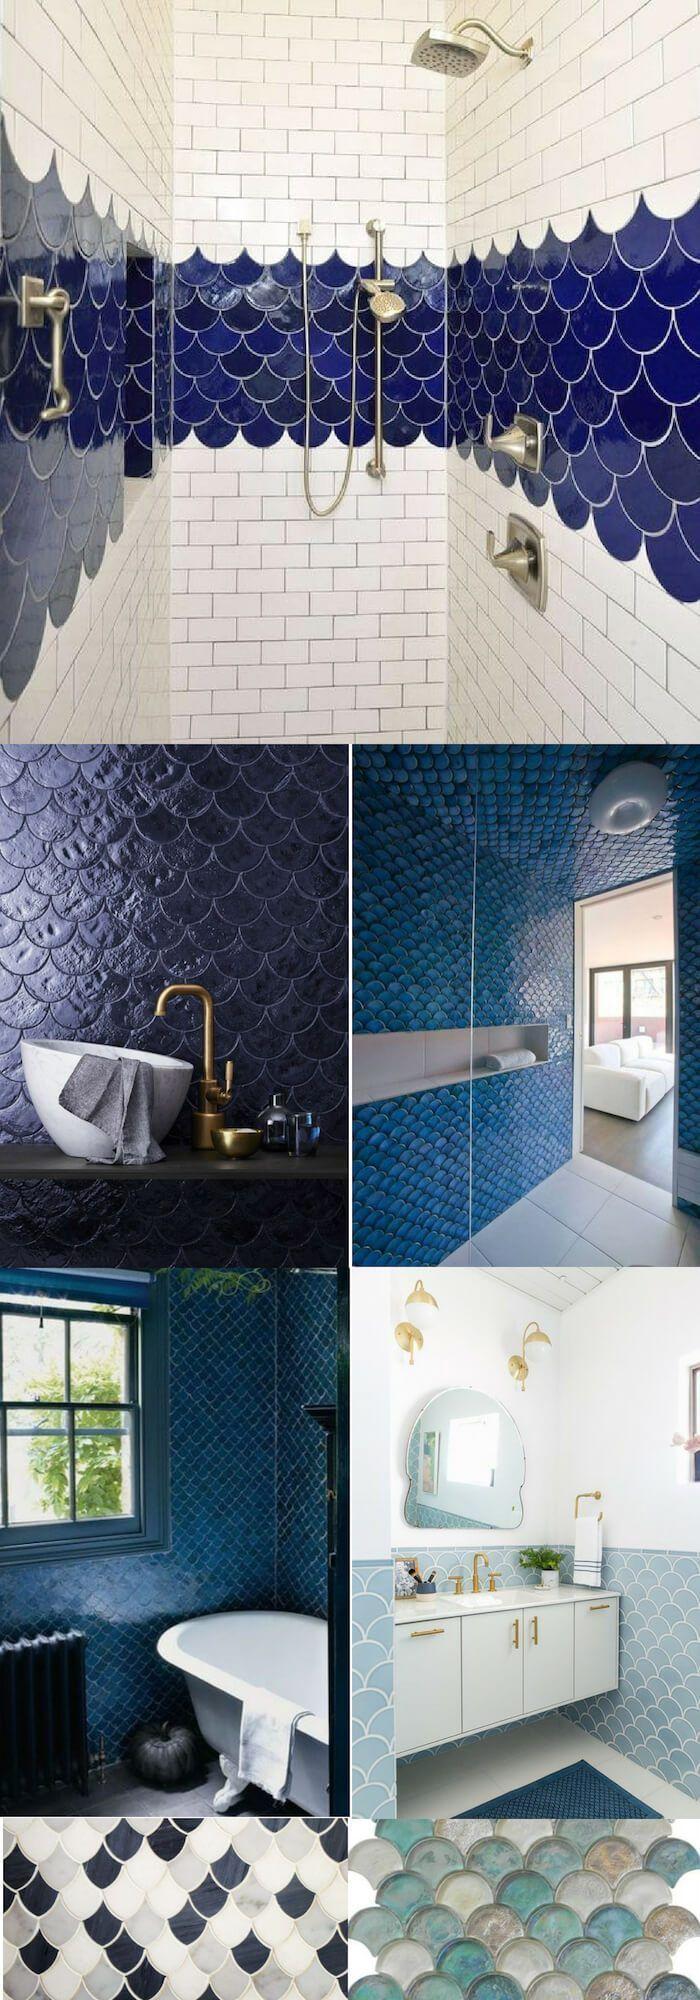 3 Small Bathroom Ideas Using Moroccan Fish Scales Fish Scale Tile Amazing Bathrooms Small Bathroom